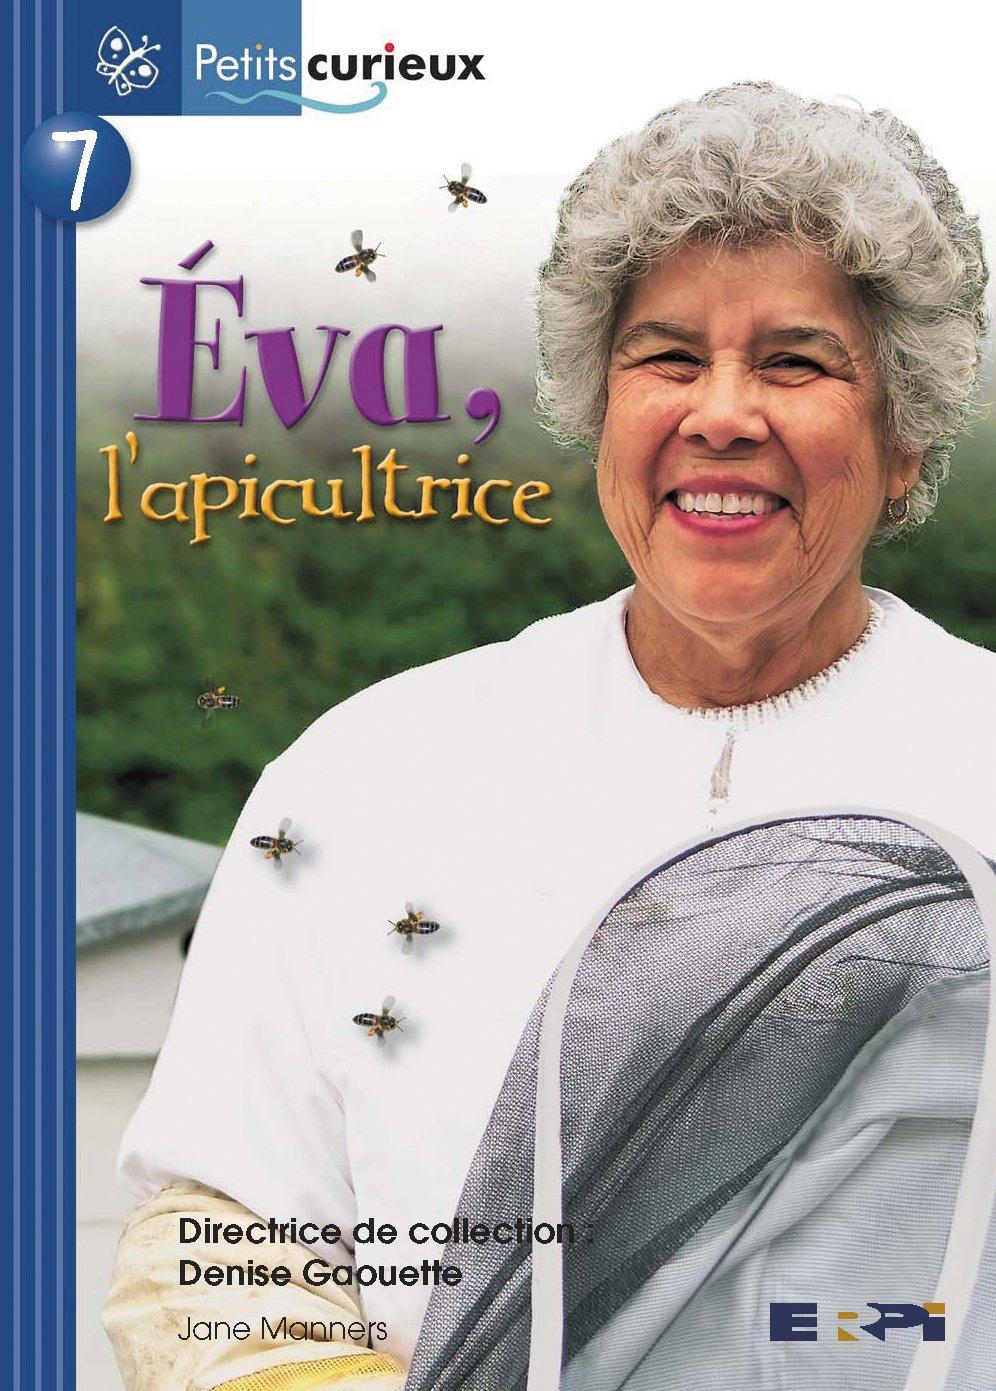 Eva L'Apicultrice: Pet.Cur.Bleu 07 (Petits Curieux) (French Edition) ebook